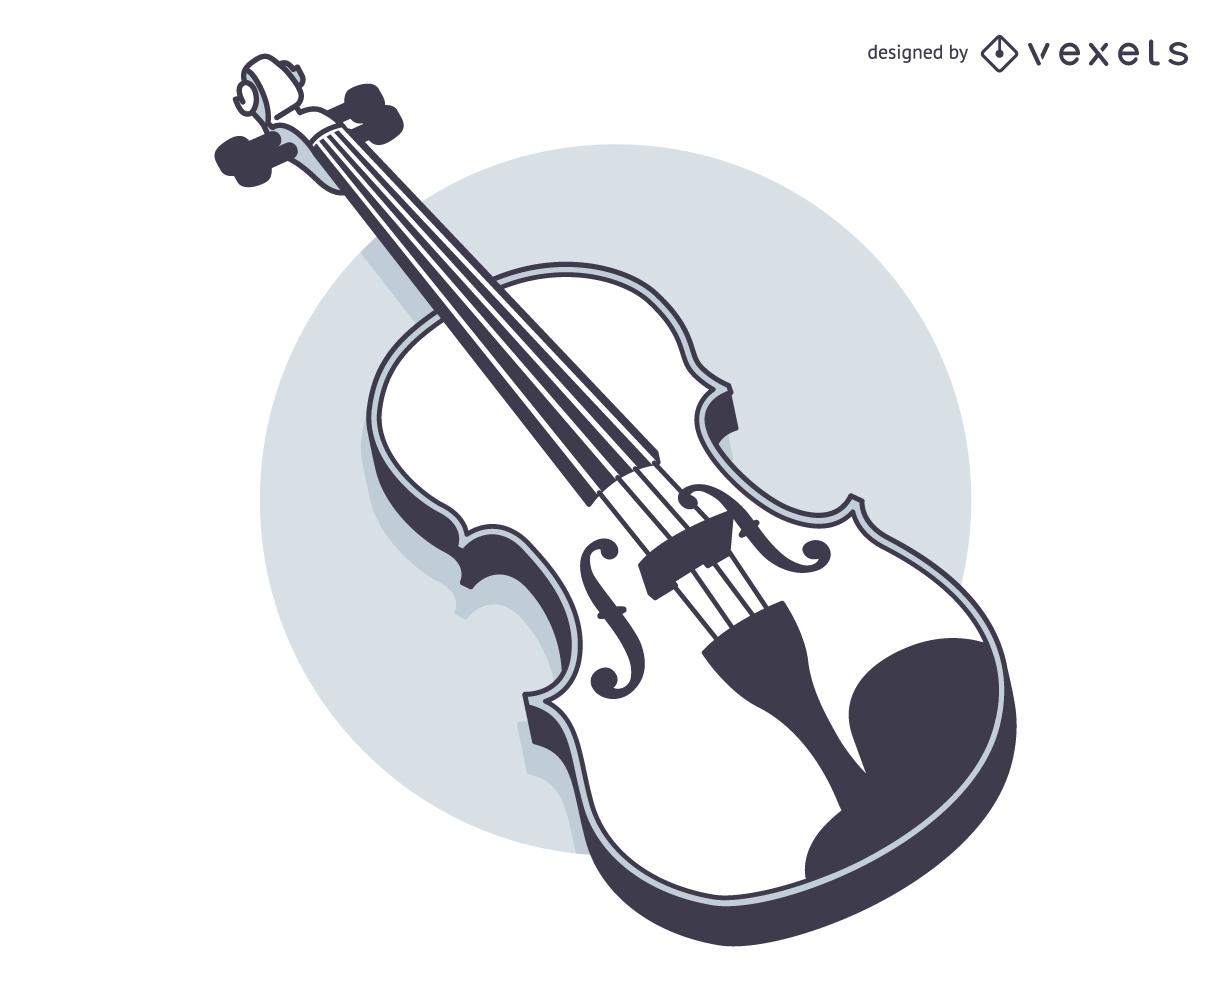 Line Art Blak and White Violin